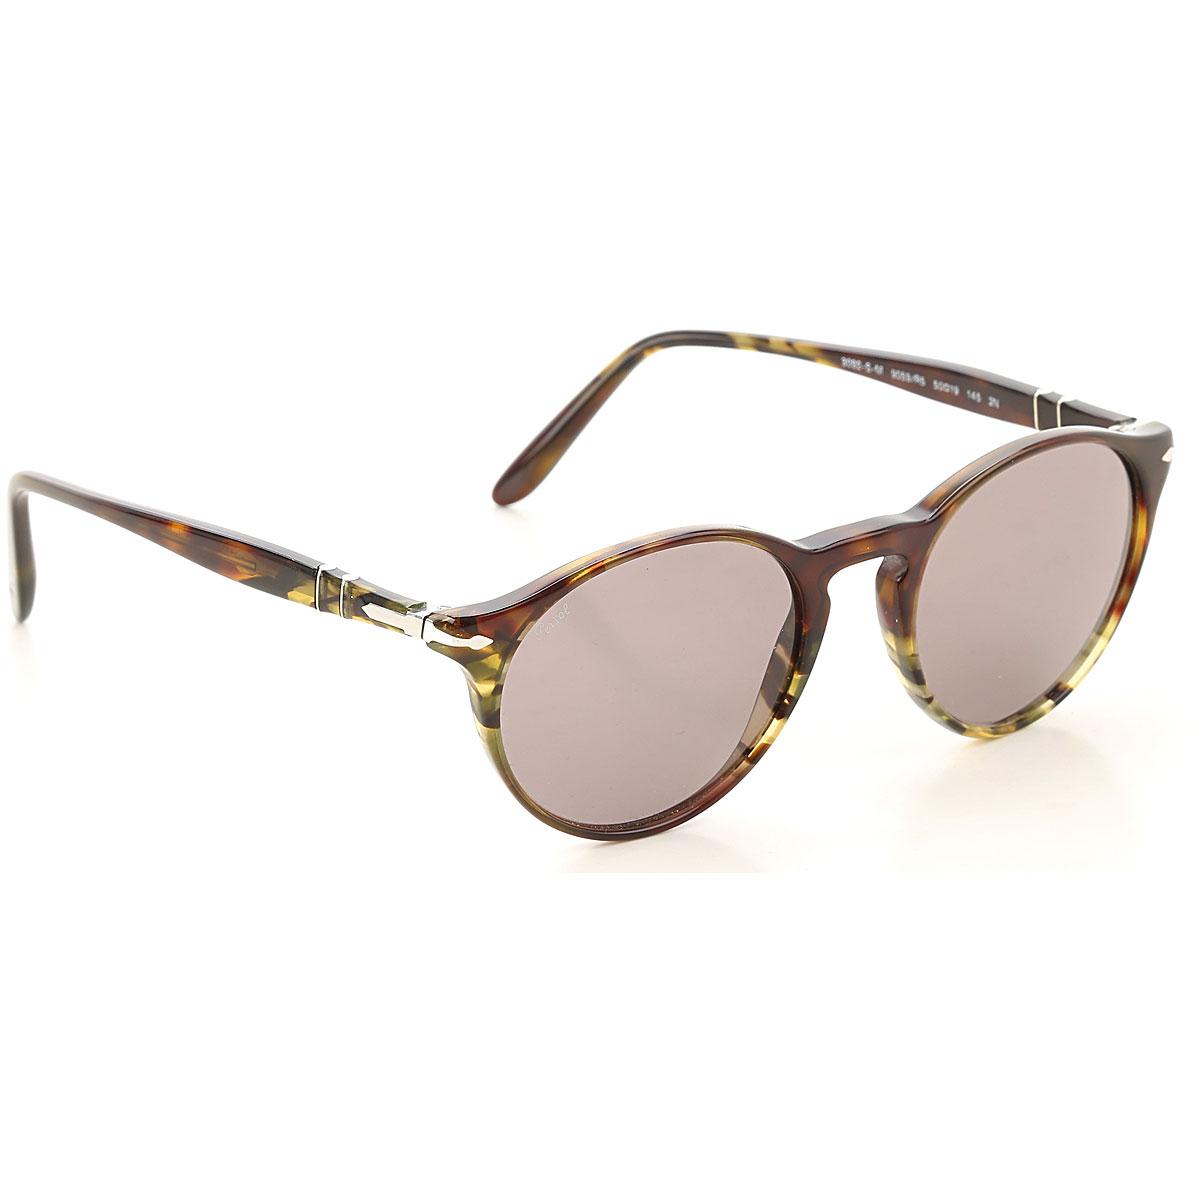 Persol Sunglasses On Sale, Green Havana, 2019